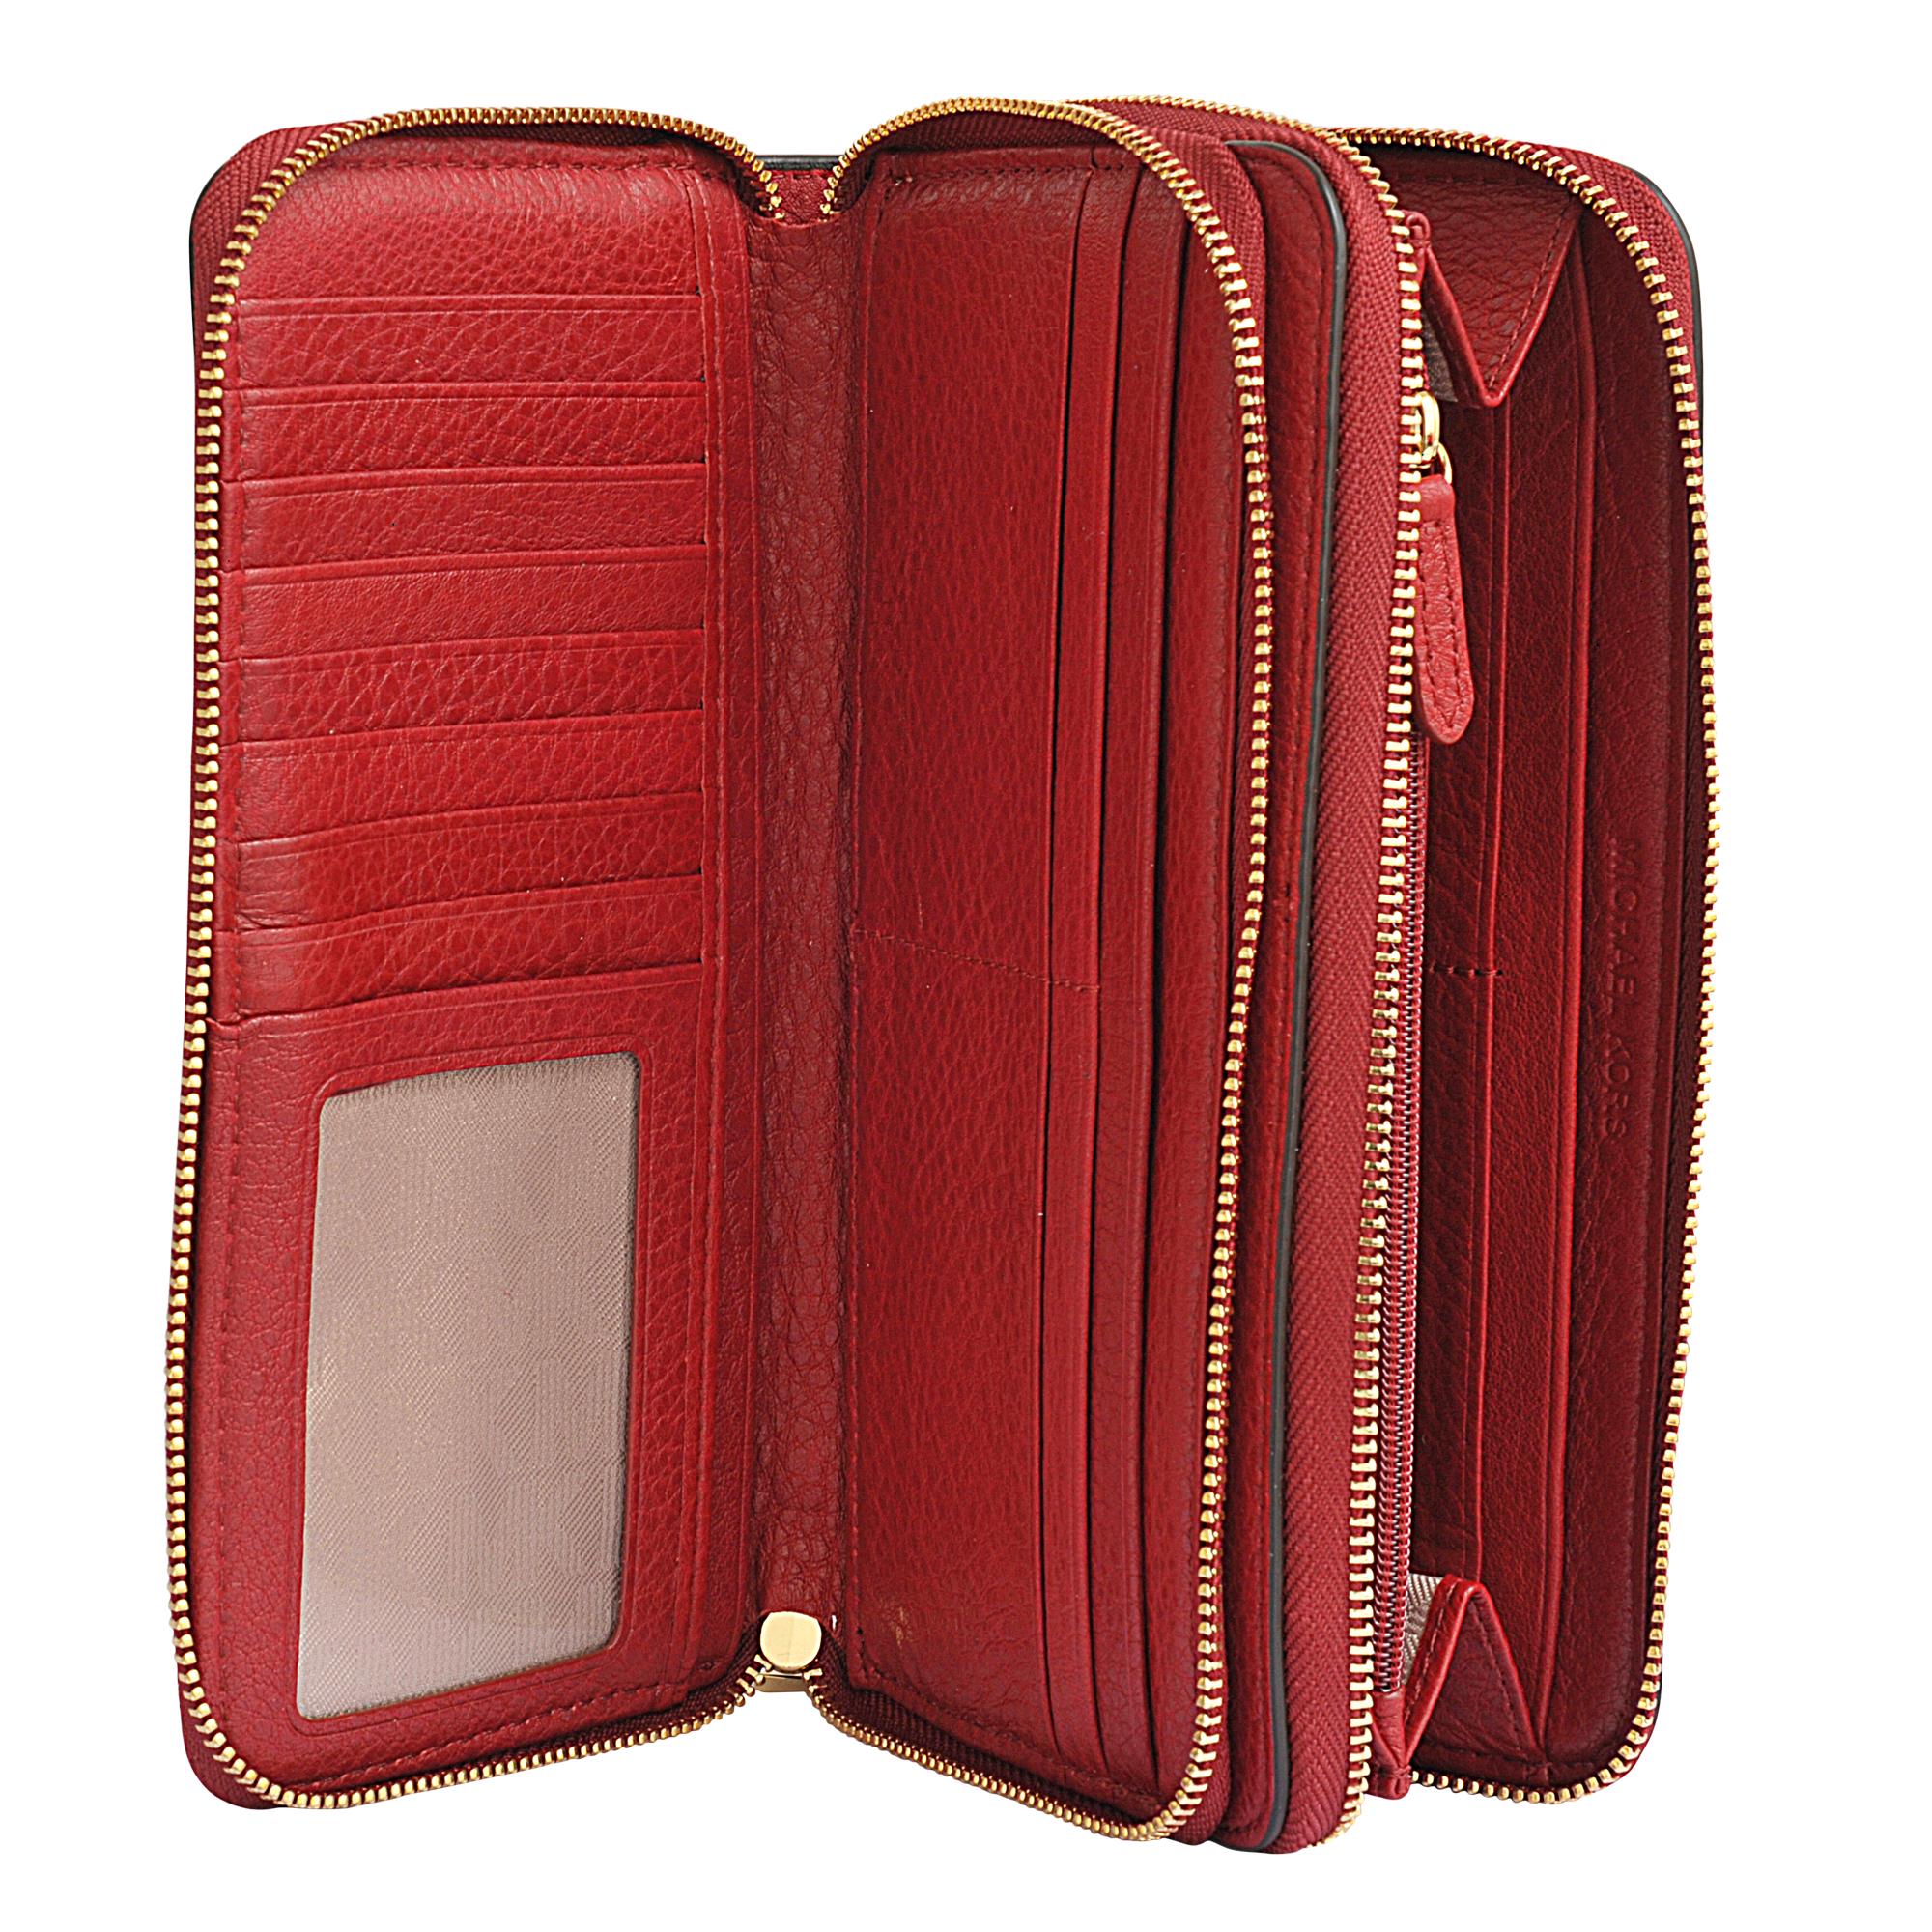 ca90c32b0be2 MICHAEL Michael Kors Adele Double Zip Wallet in Red - Lyst